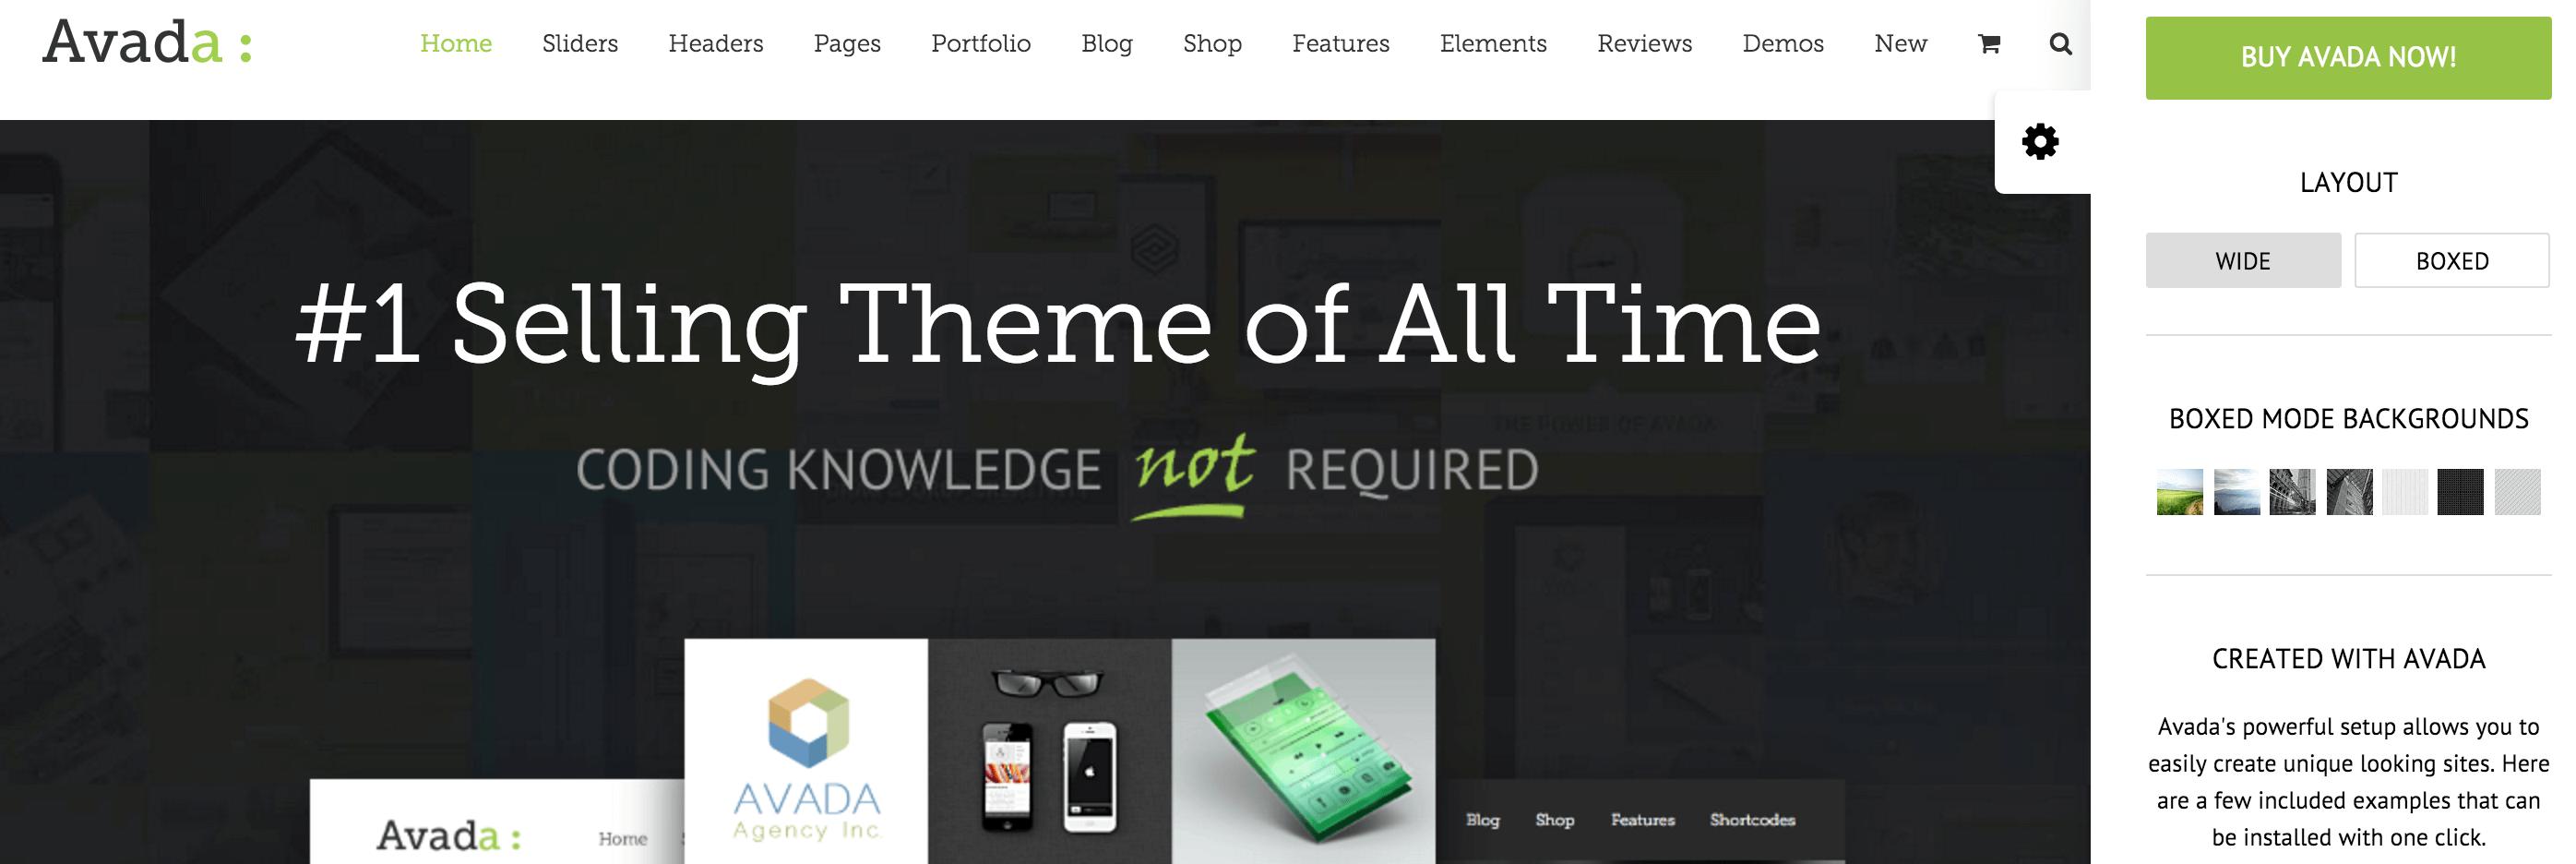 A screenshot of the Avada theme.